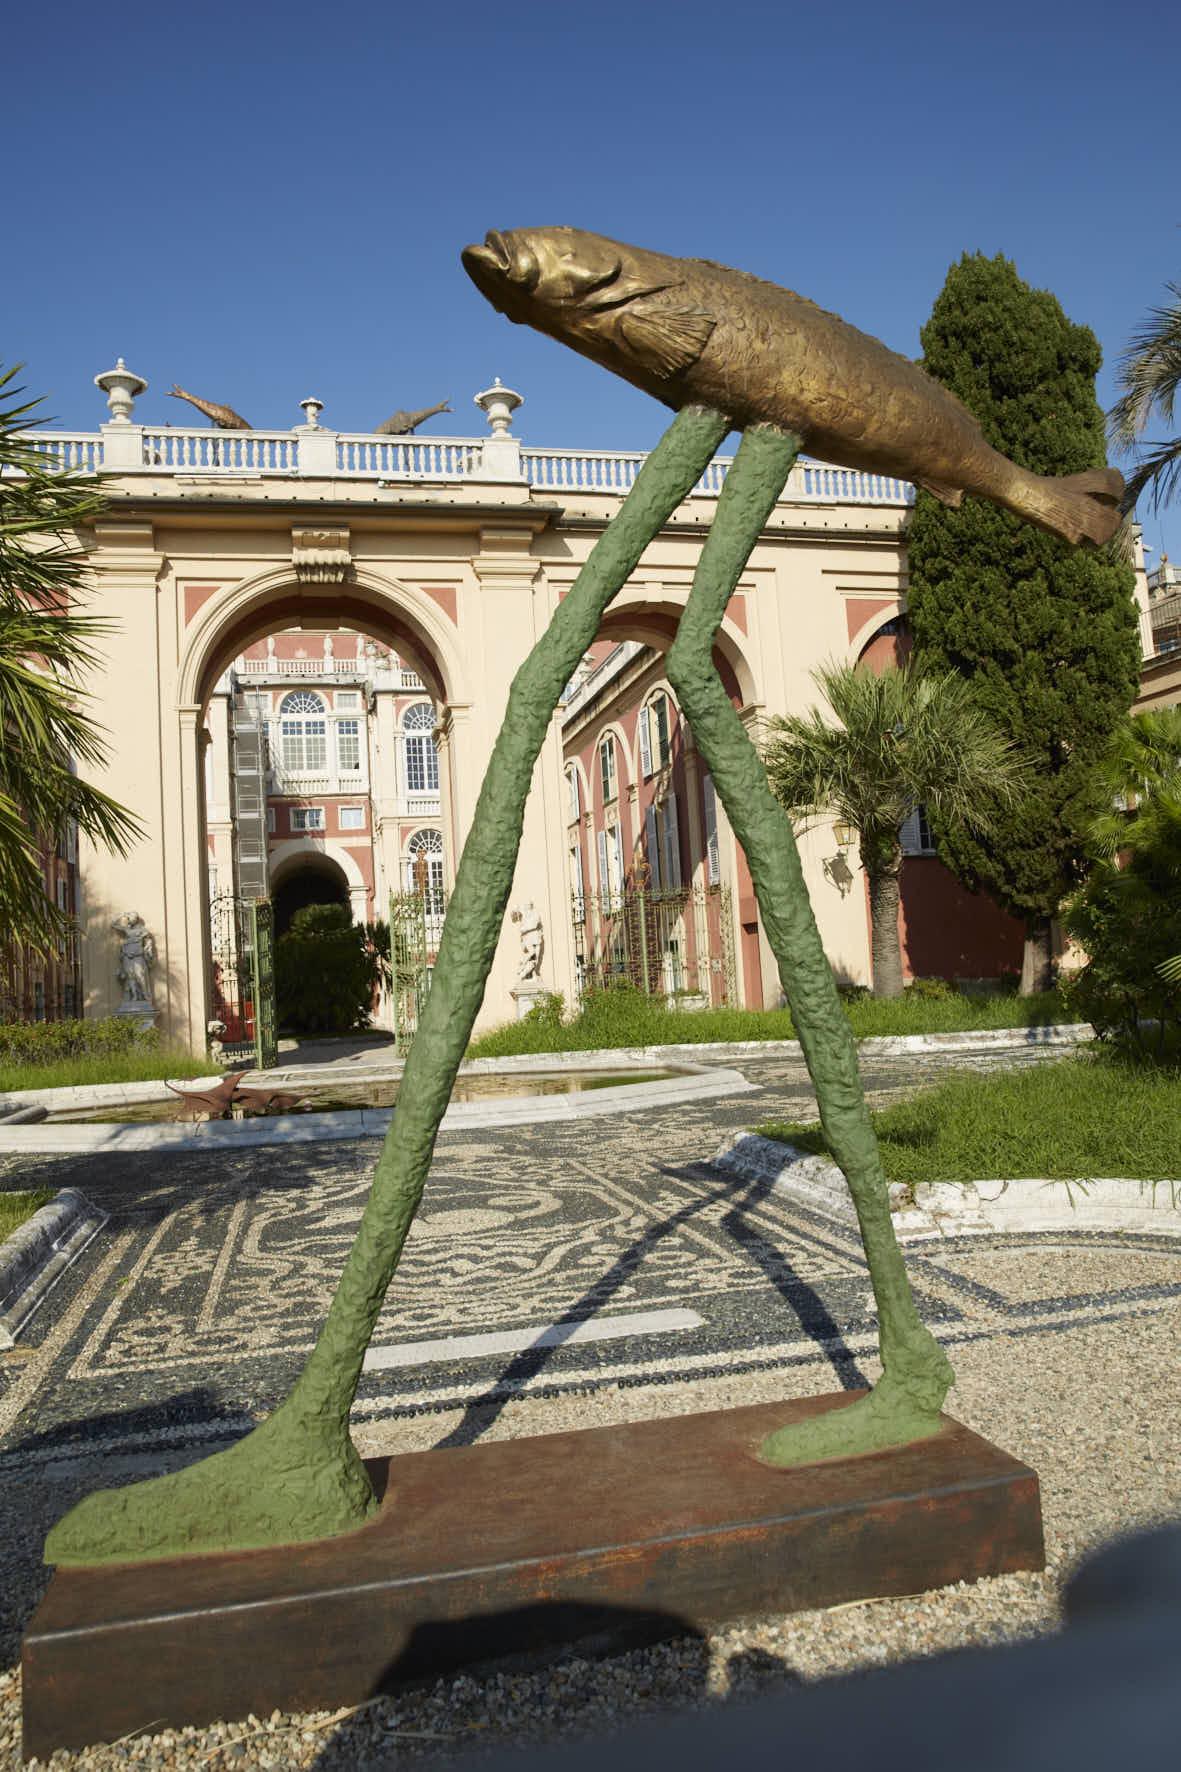 Aldo Mondino, Moderno Post-moderno Contemporaneo, Villa Croce